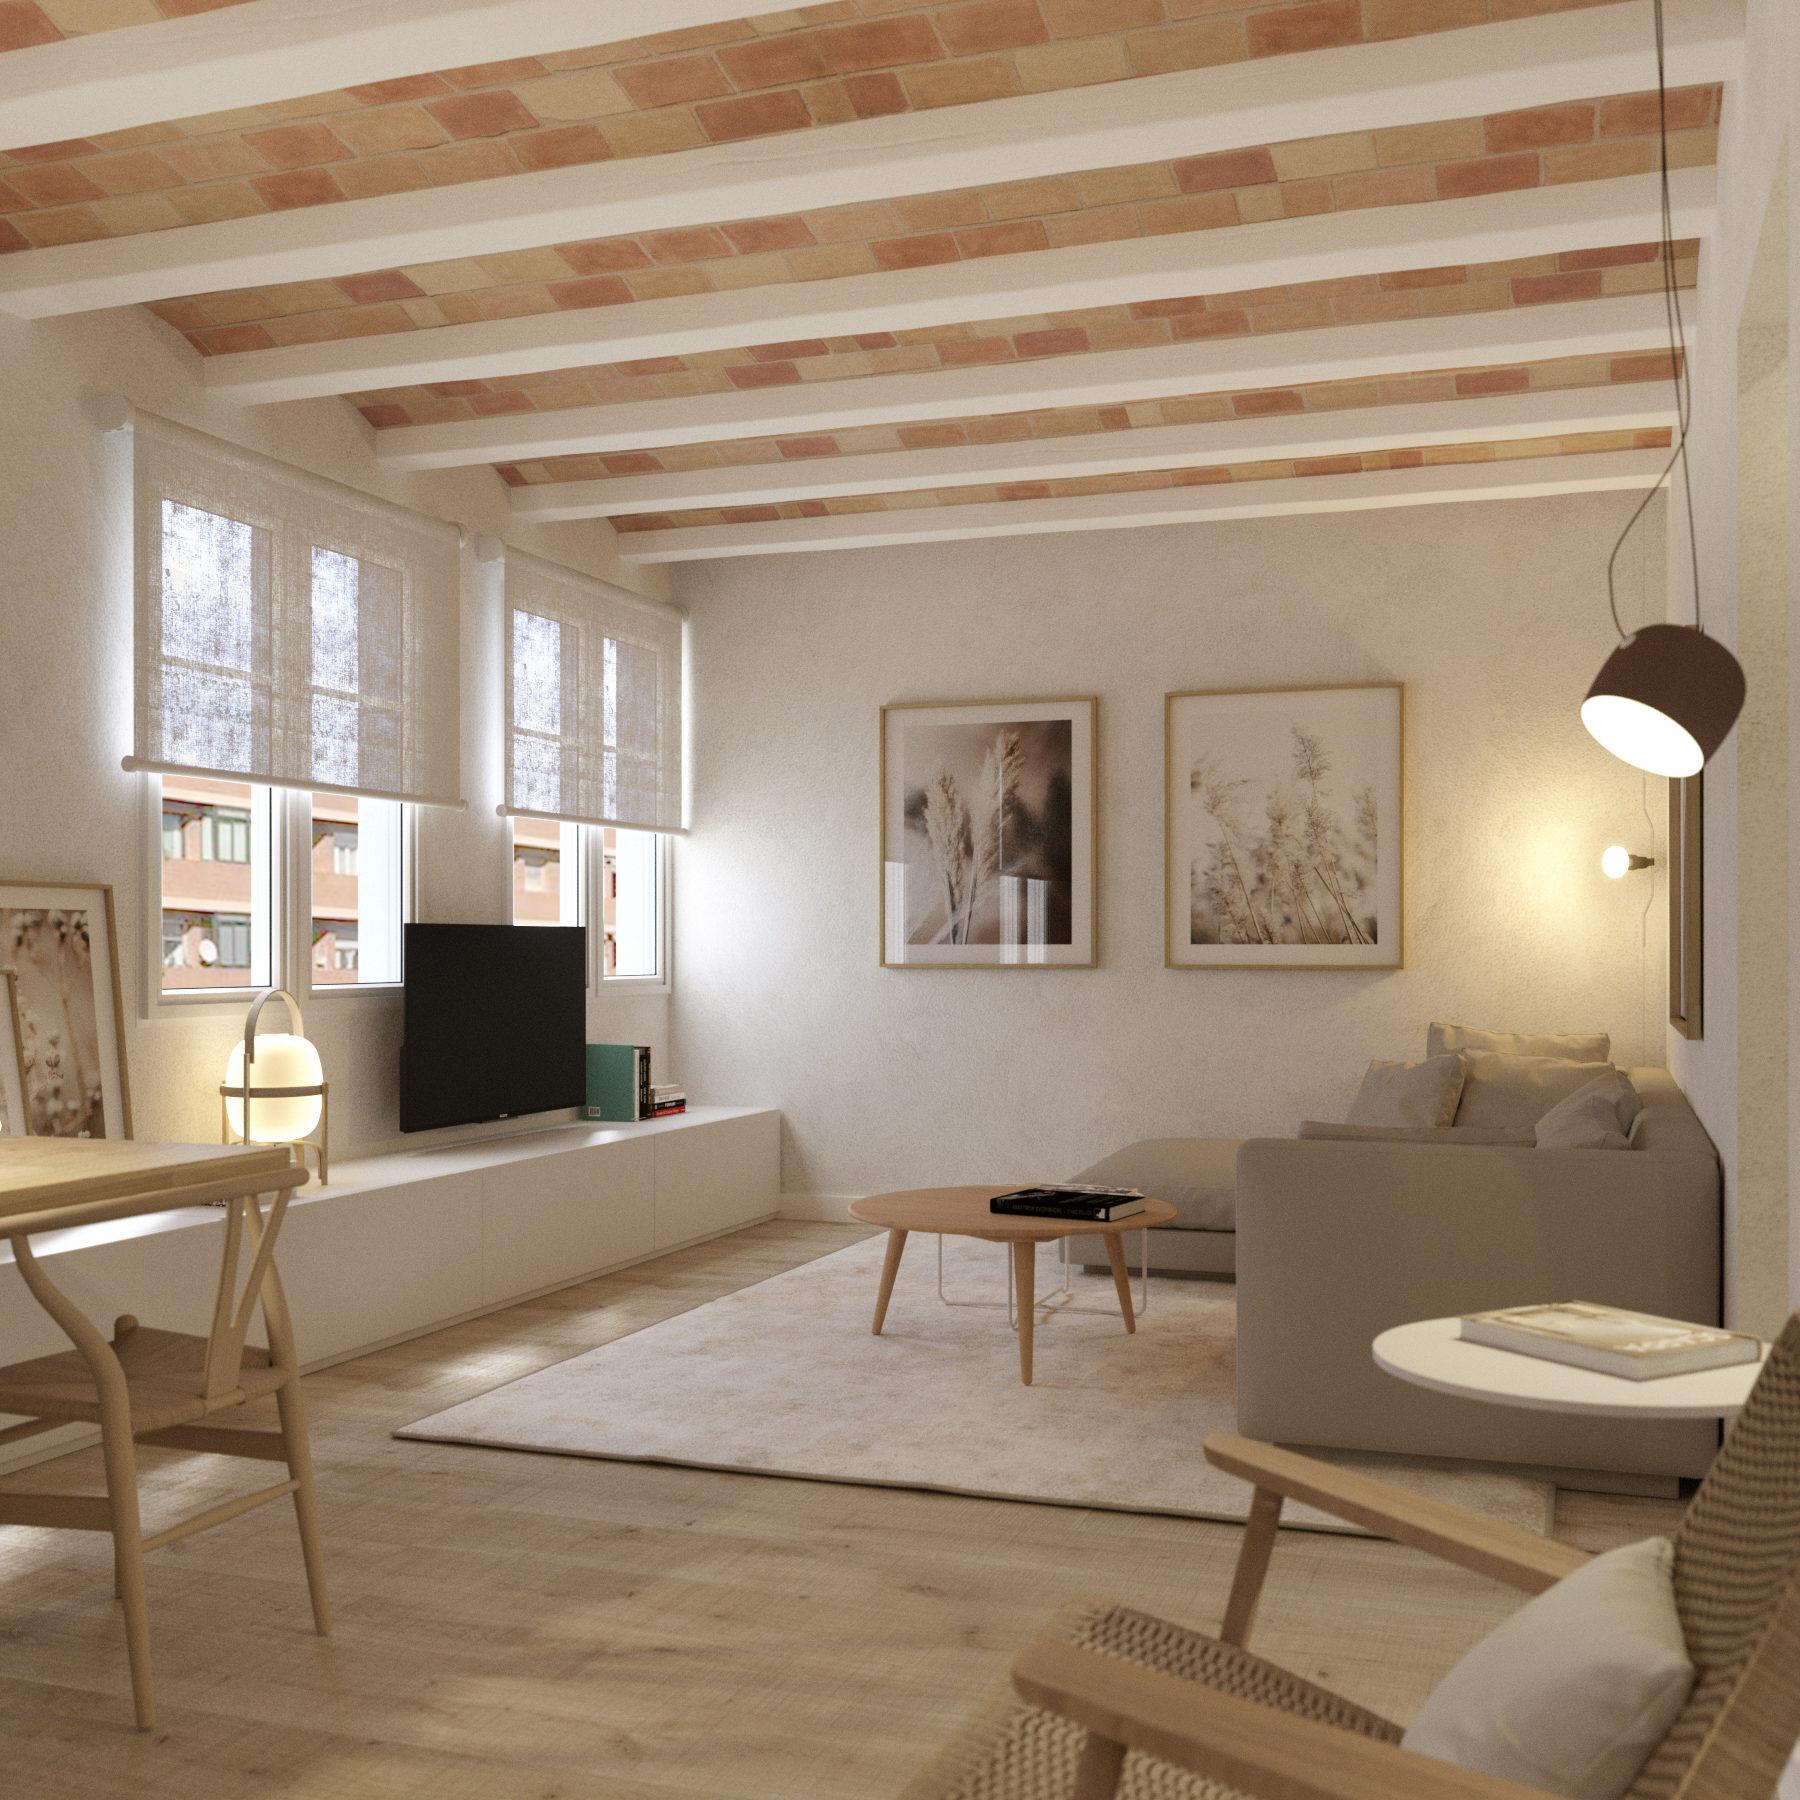 En venta fantástico piso en l'Eixample barri de la Sagrada Familia carrer Padilla